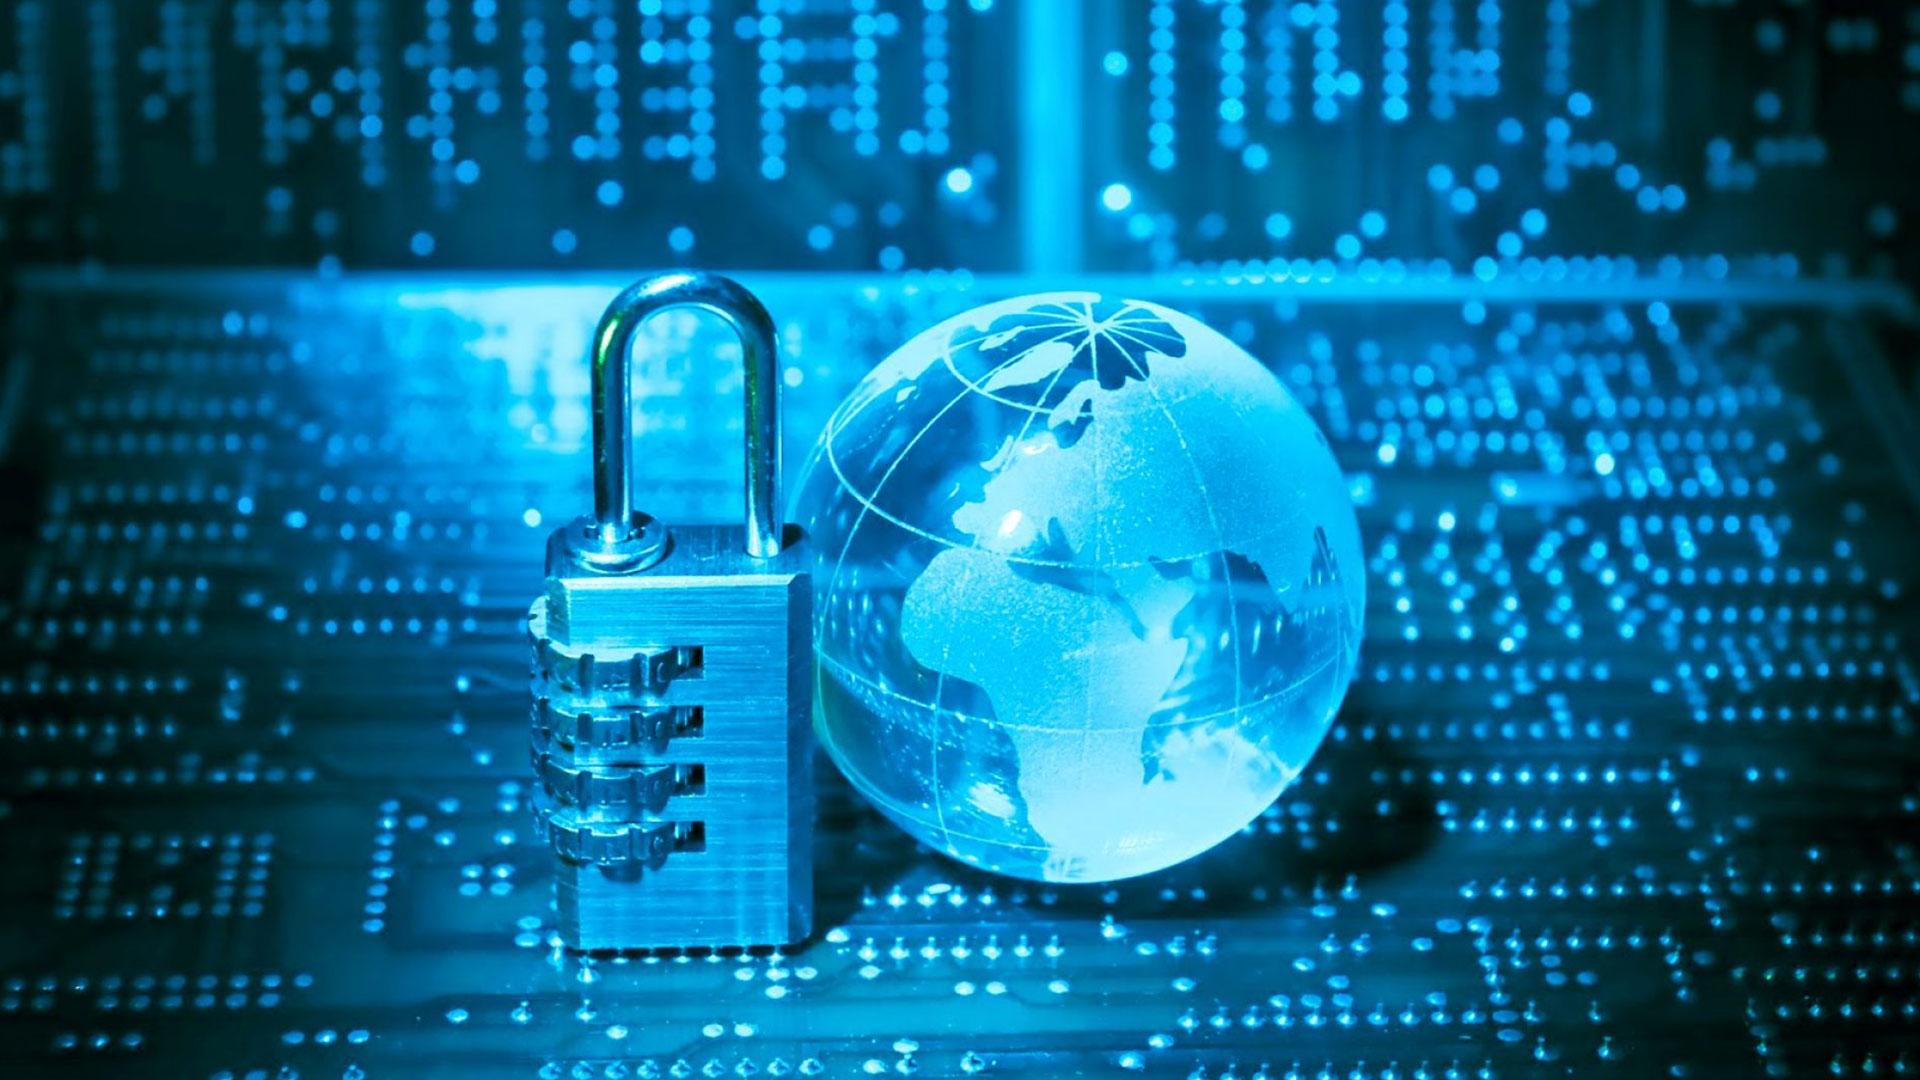 Blue padlock with globe figure